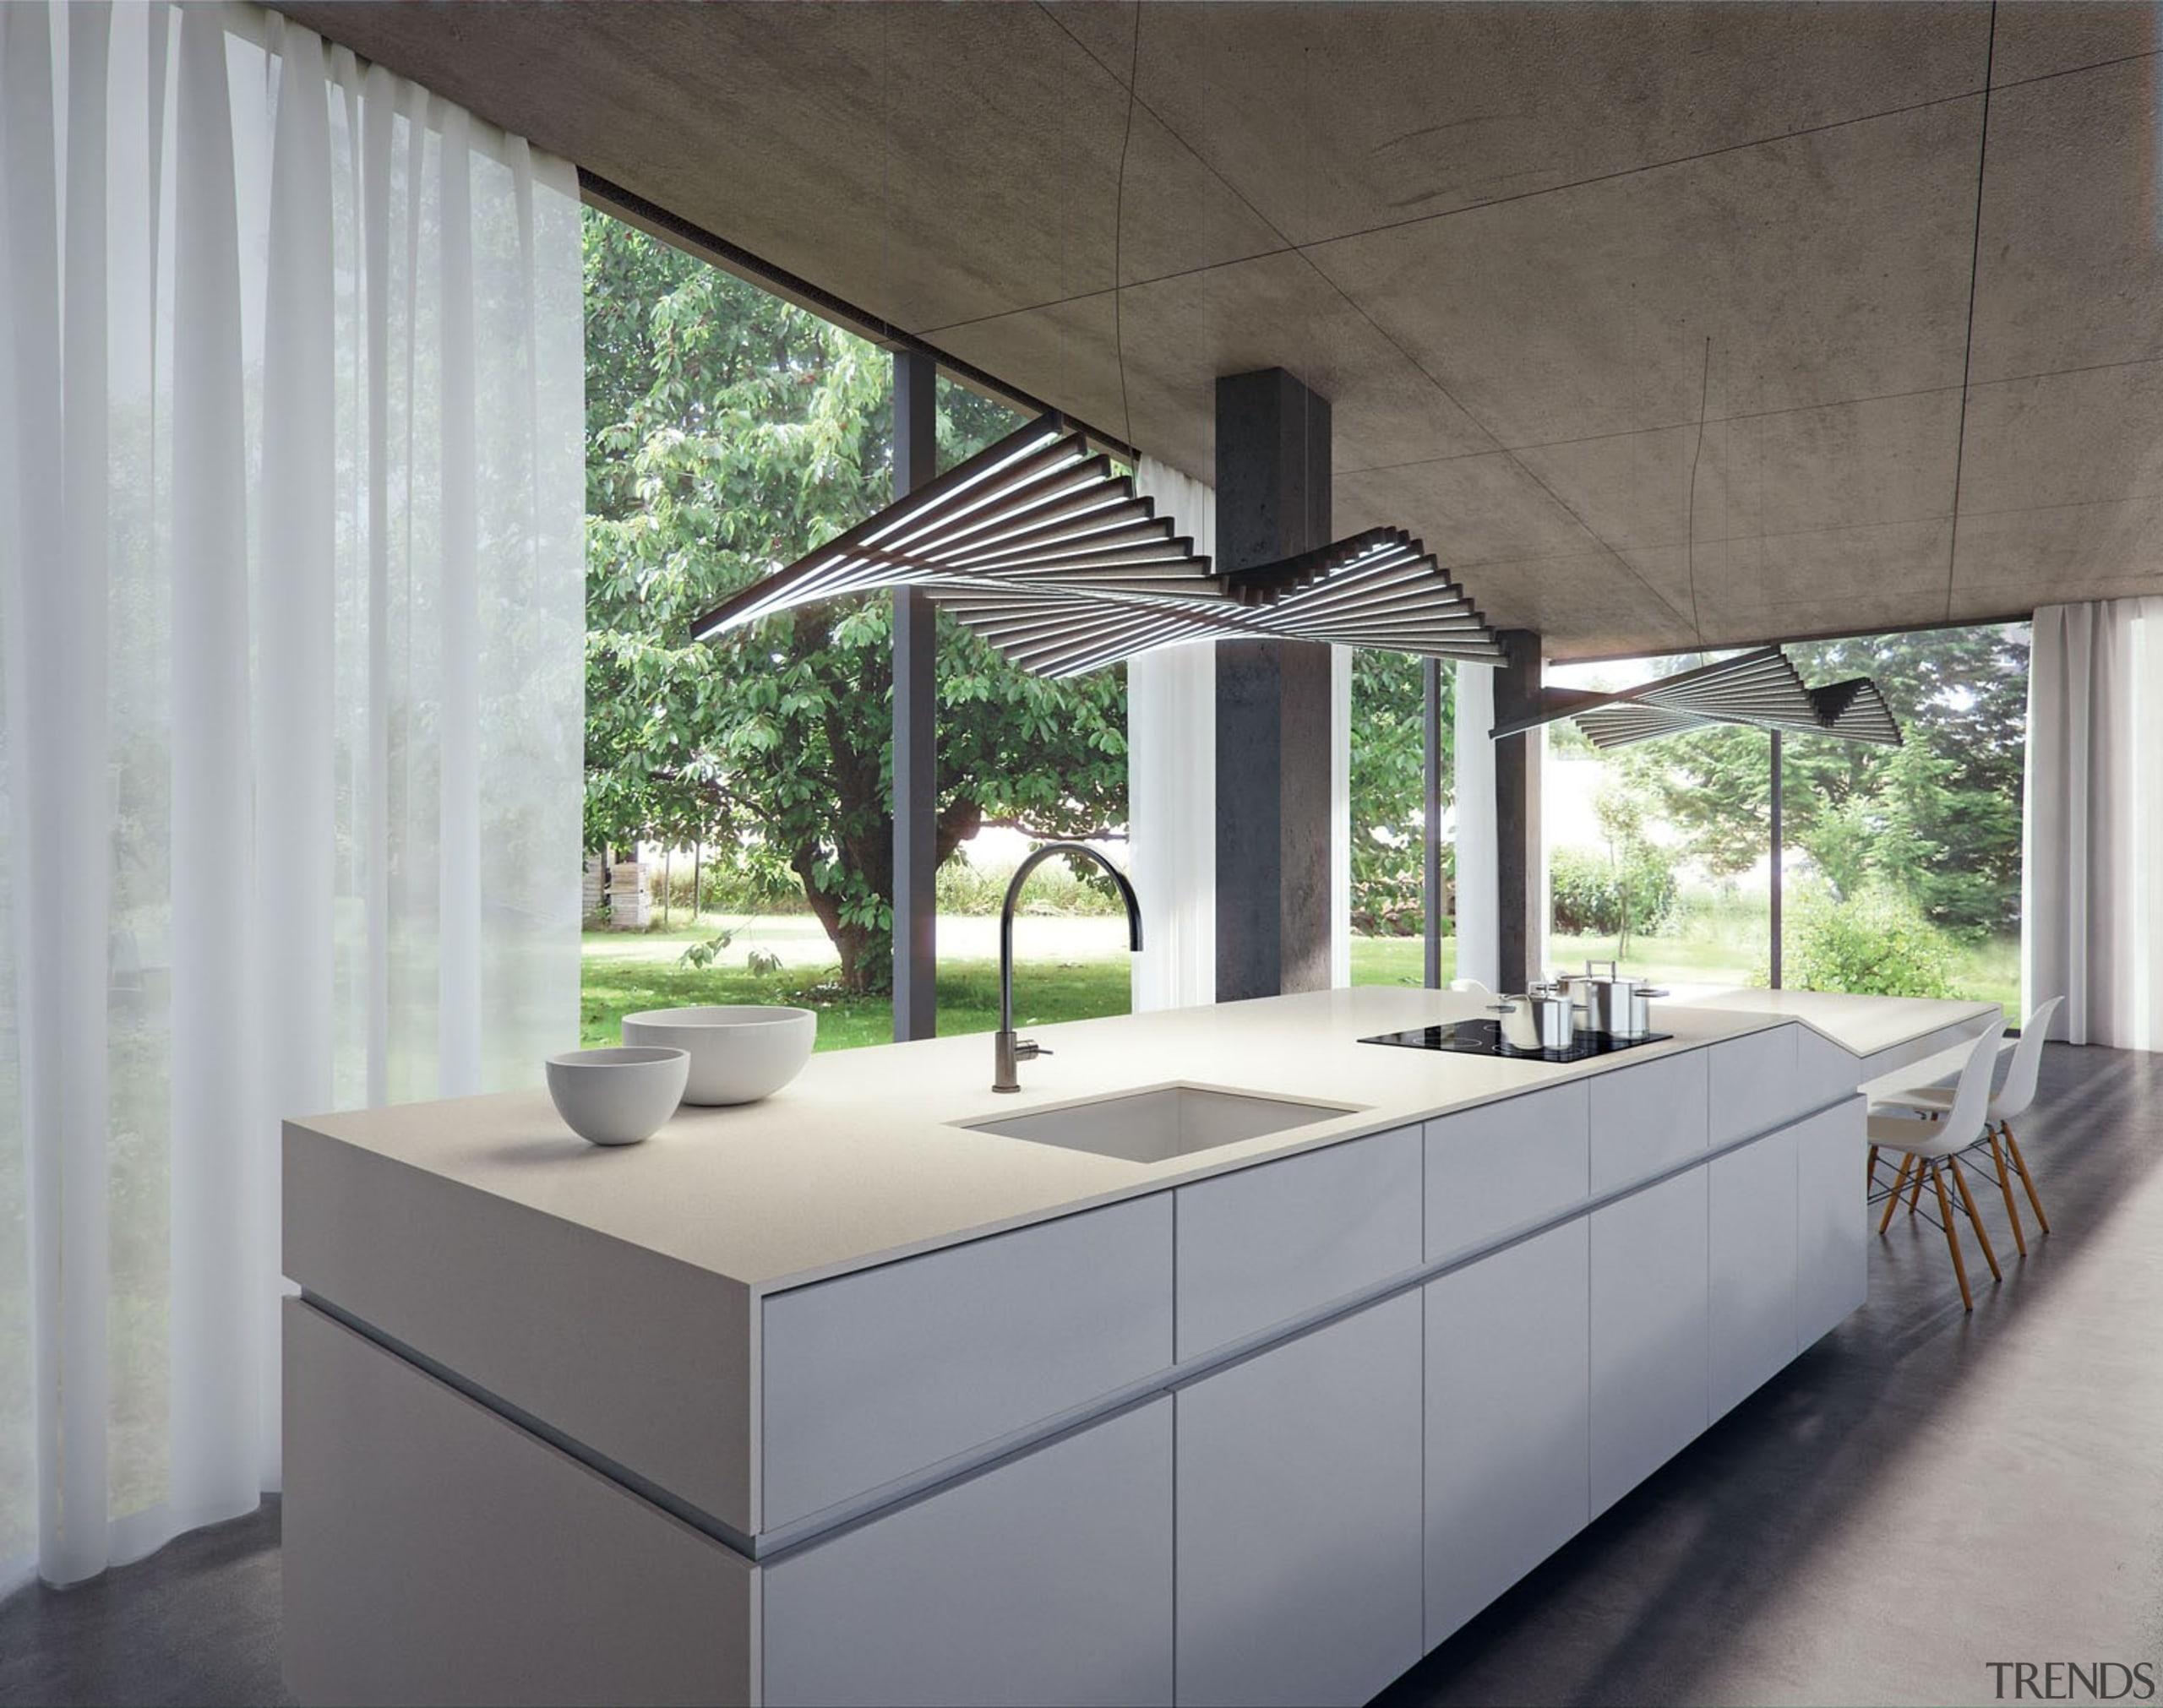 4001freshconcreterender.jpg - 4001freshconcreterender.jpg - architecture   daylighting   architecture, daylighting, house, interior design, gray